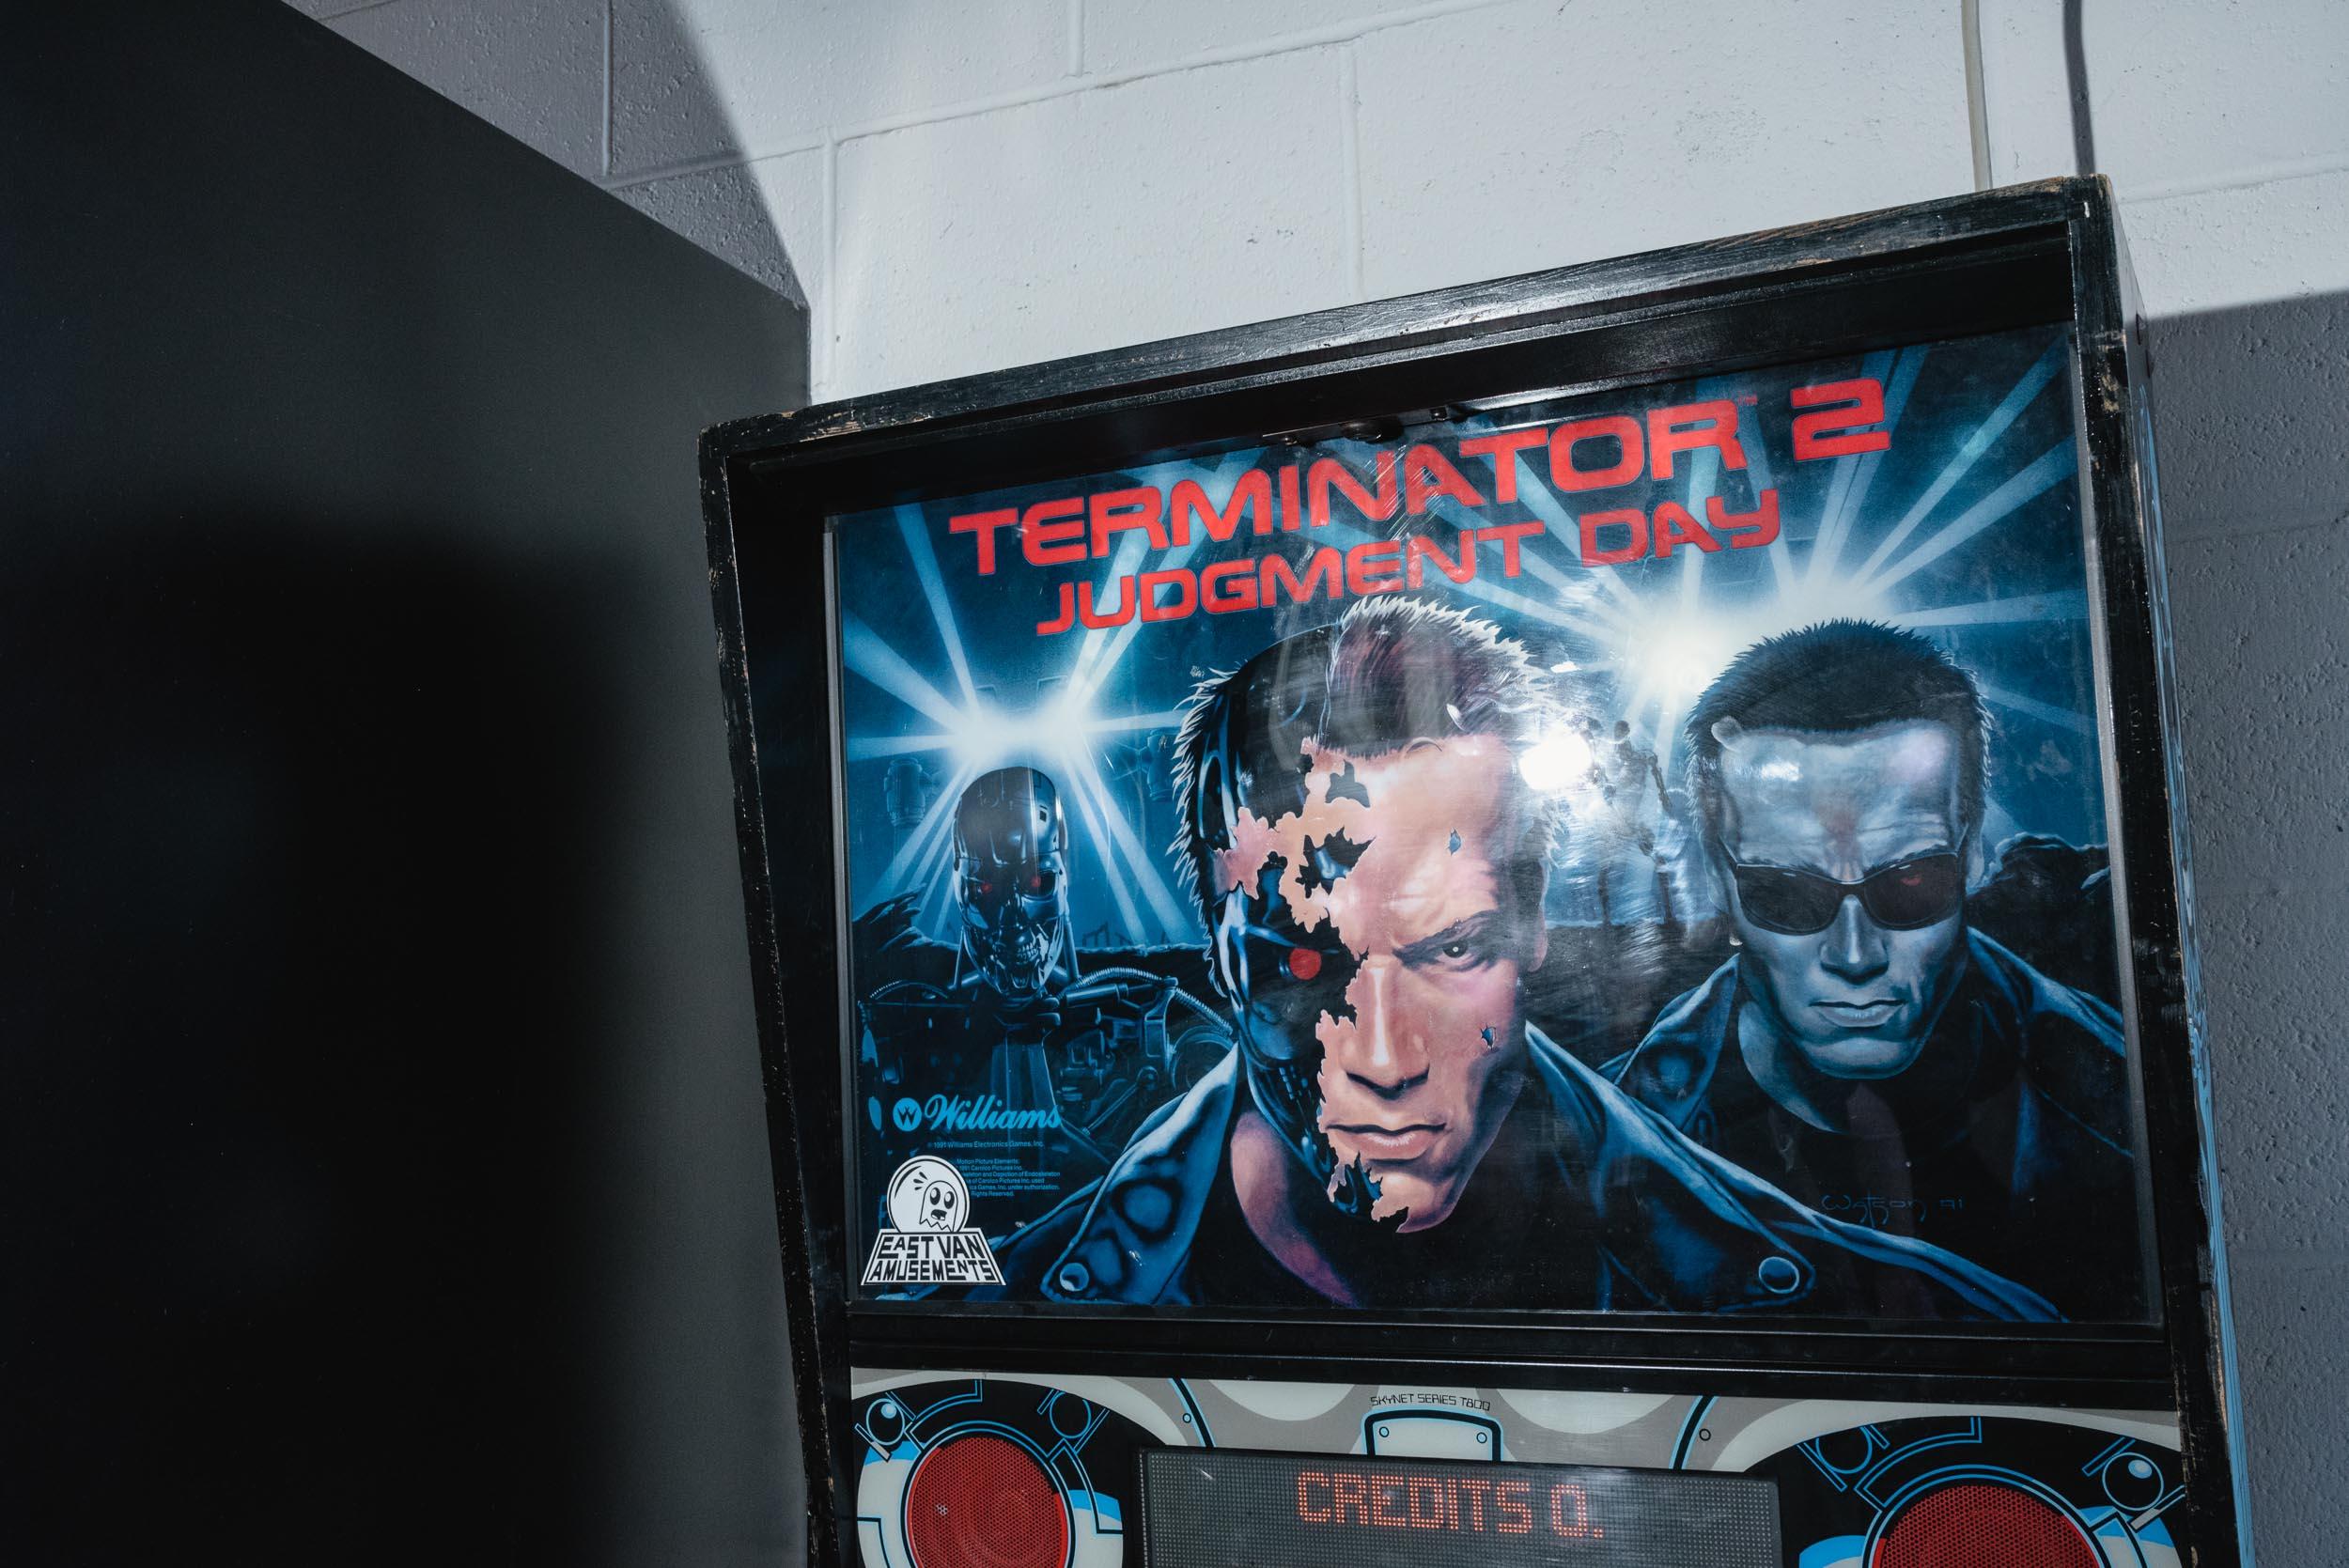 Terminator pinball arcade game